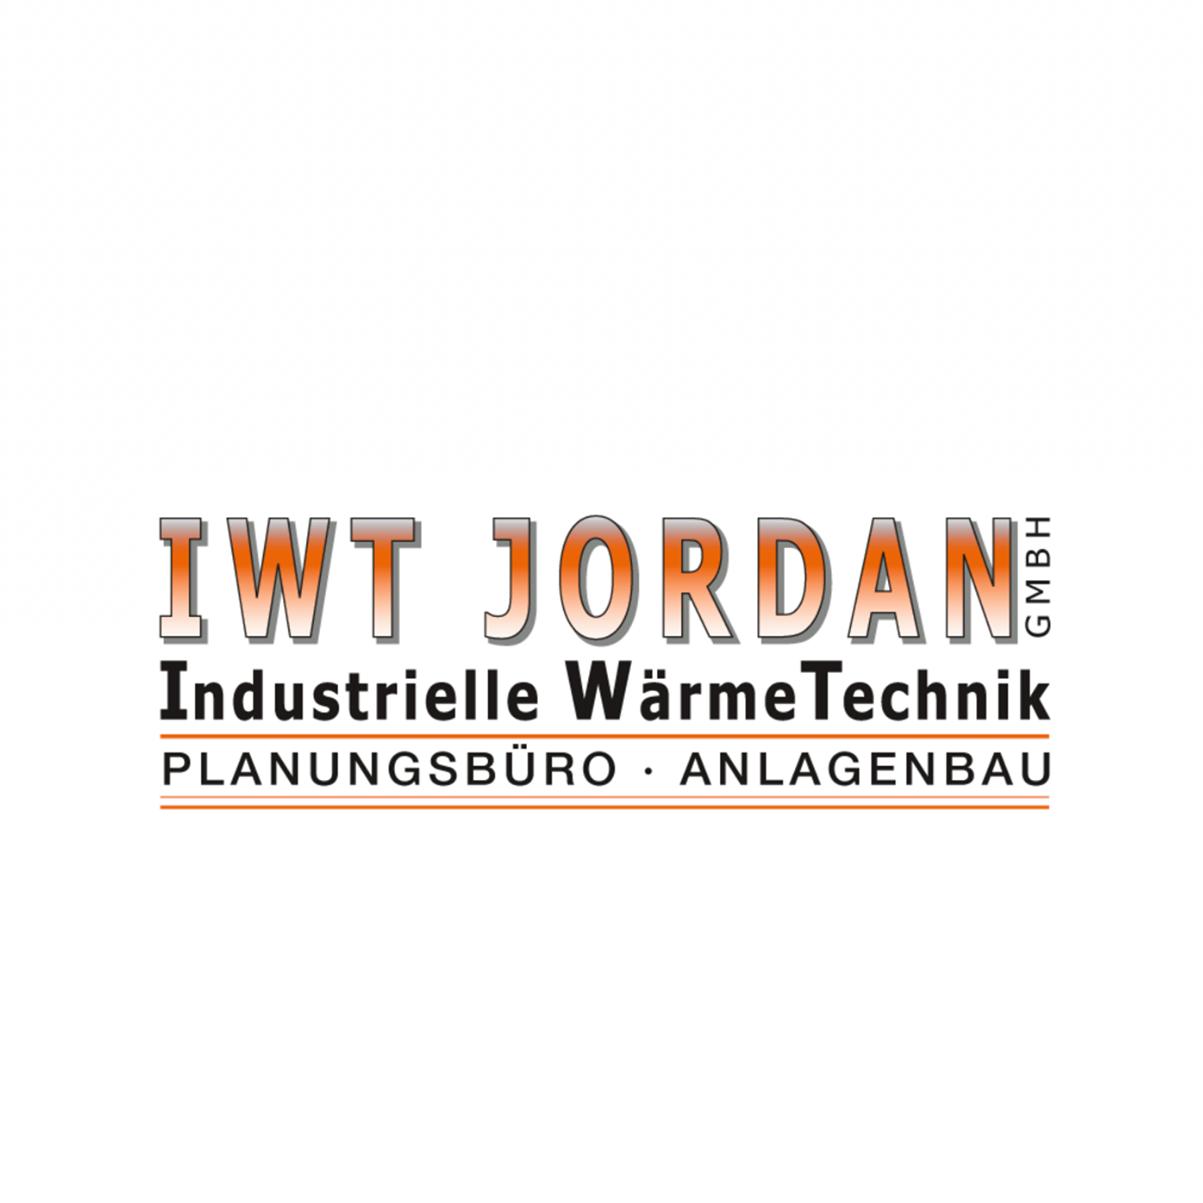 IWT Jordan GmbH